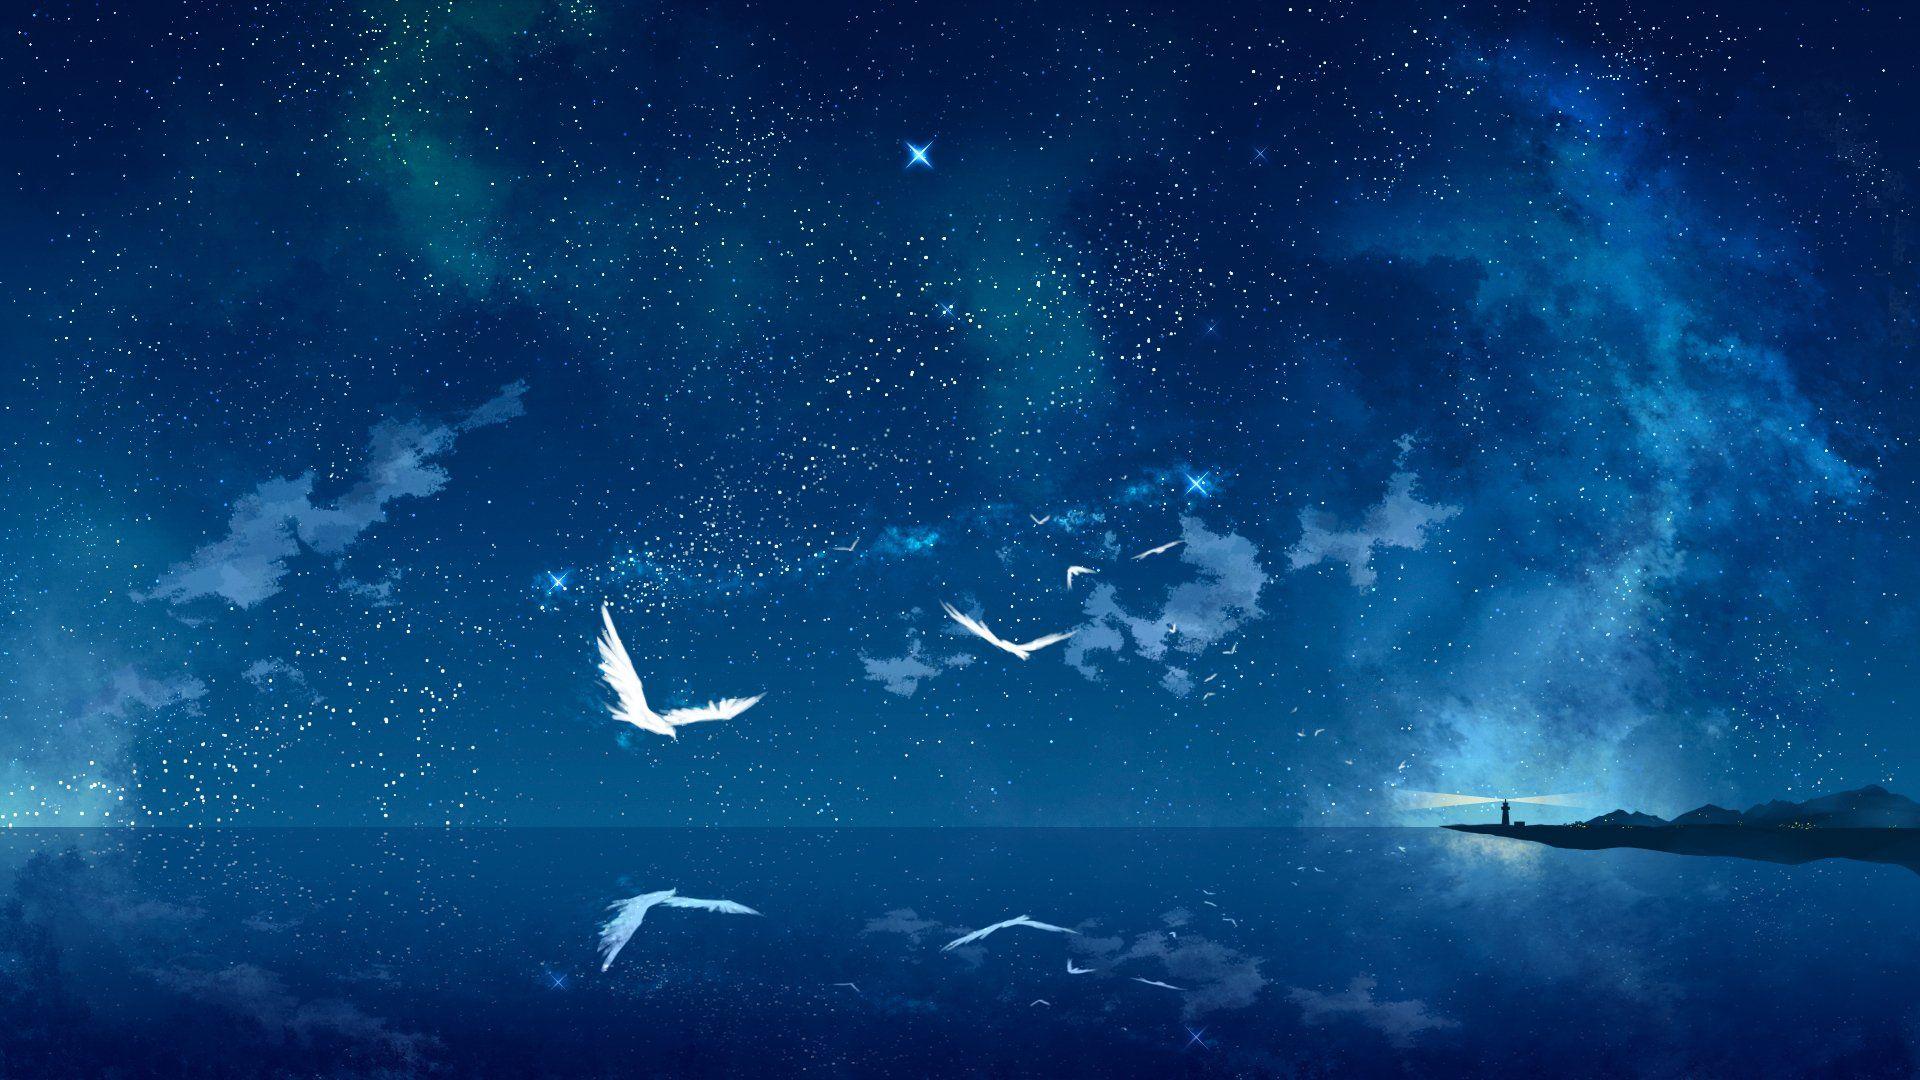 anime landscape backgrounds